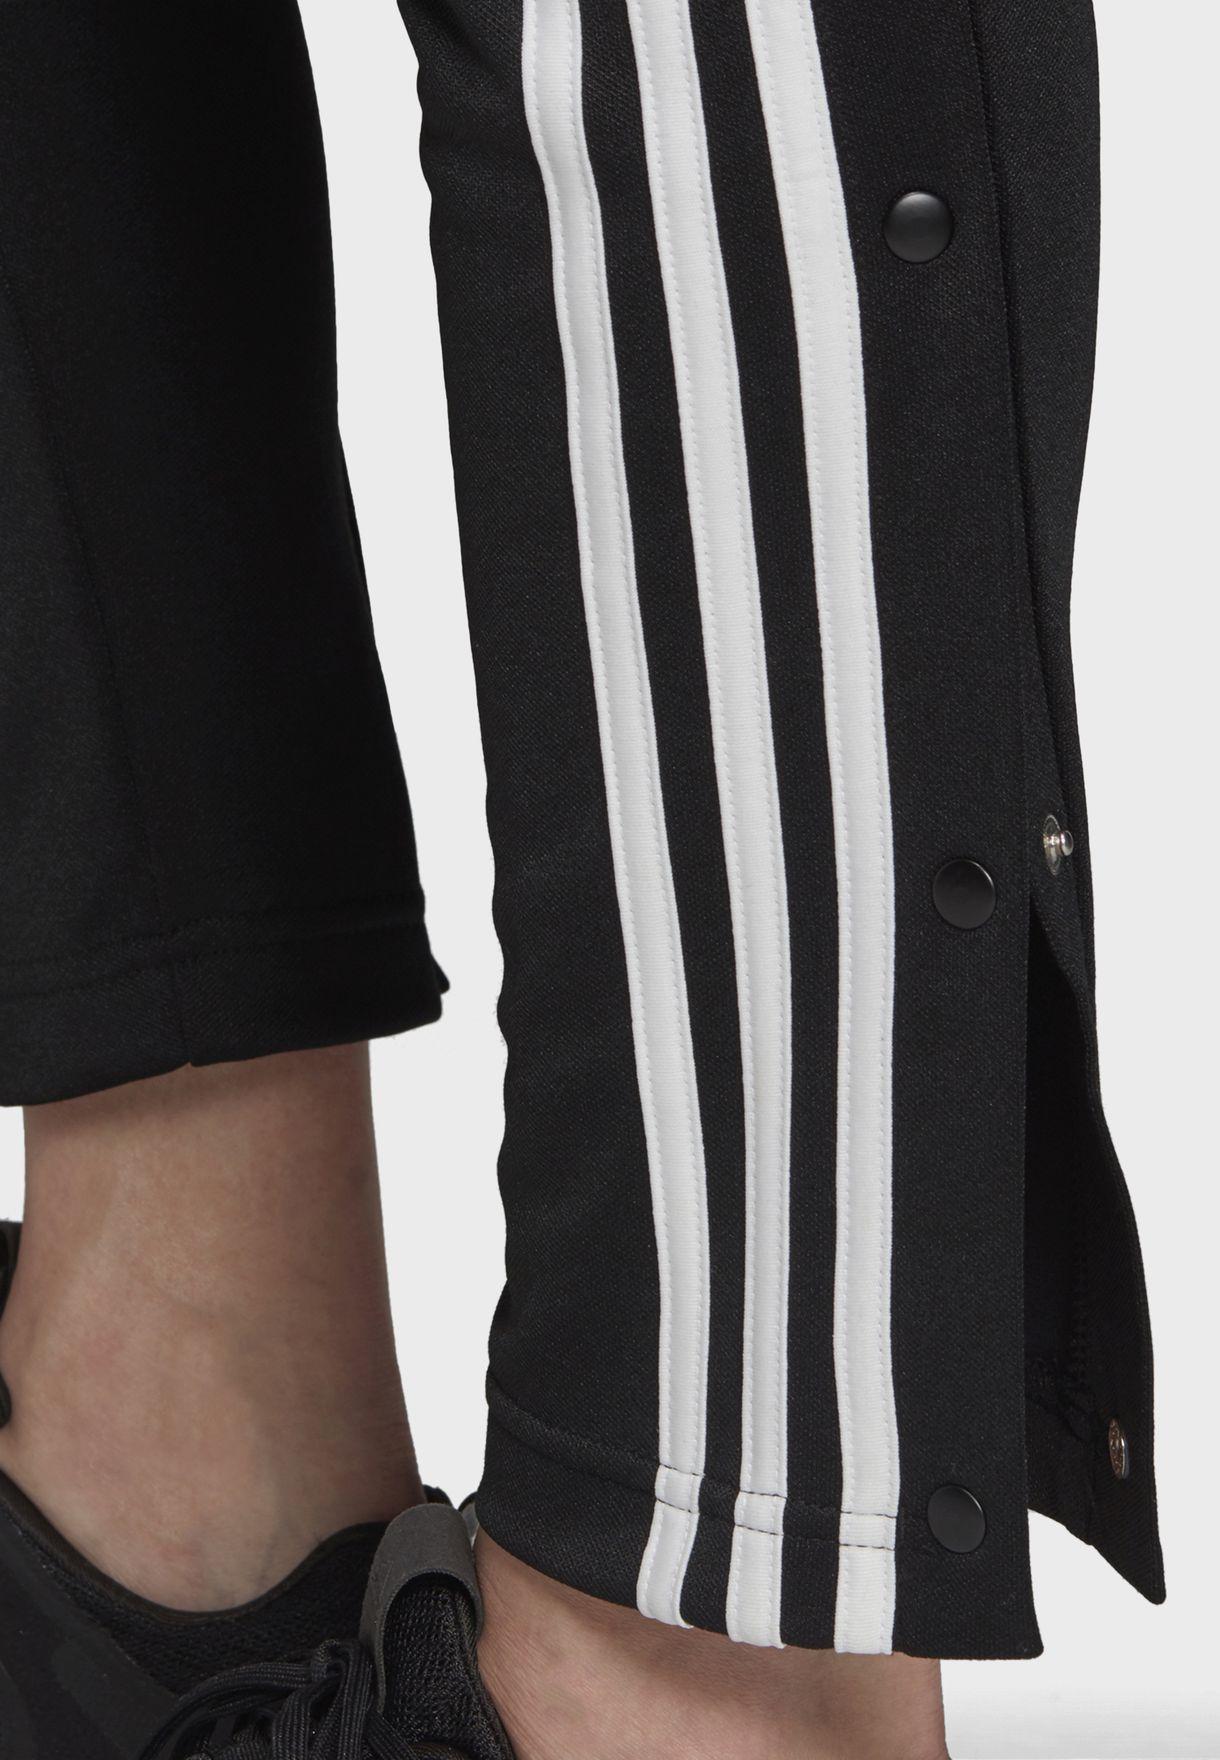 3 Stripes ID Snap Sweatpants